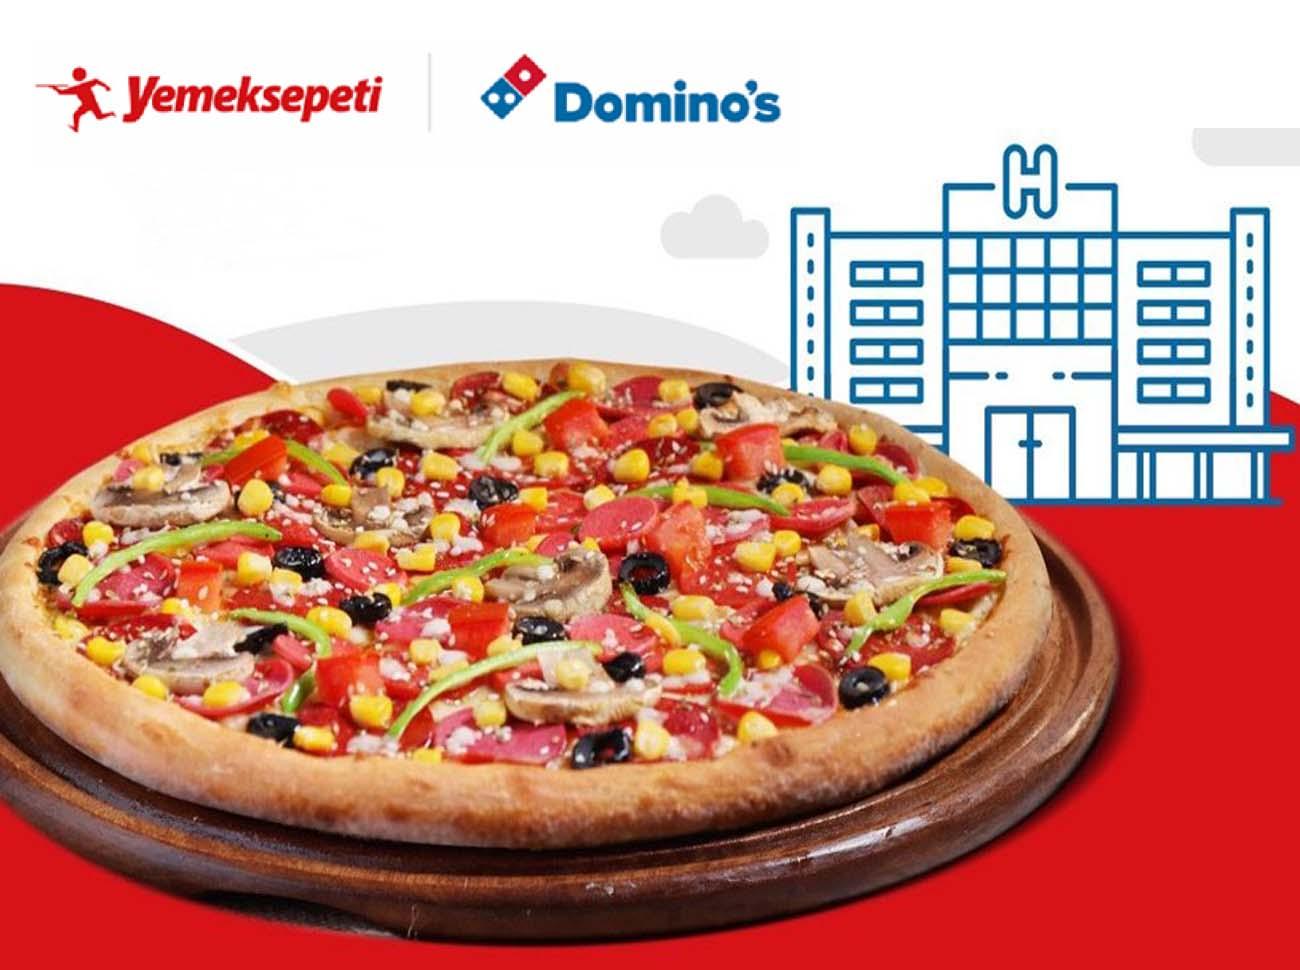 Dominos Ve Yemeksepeti'nden 150 Bin Pizza